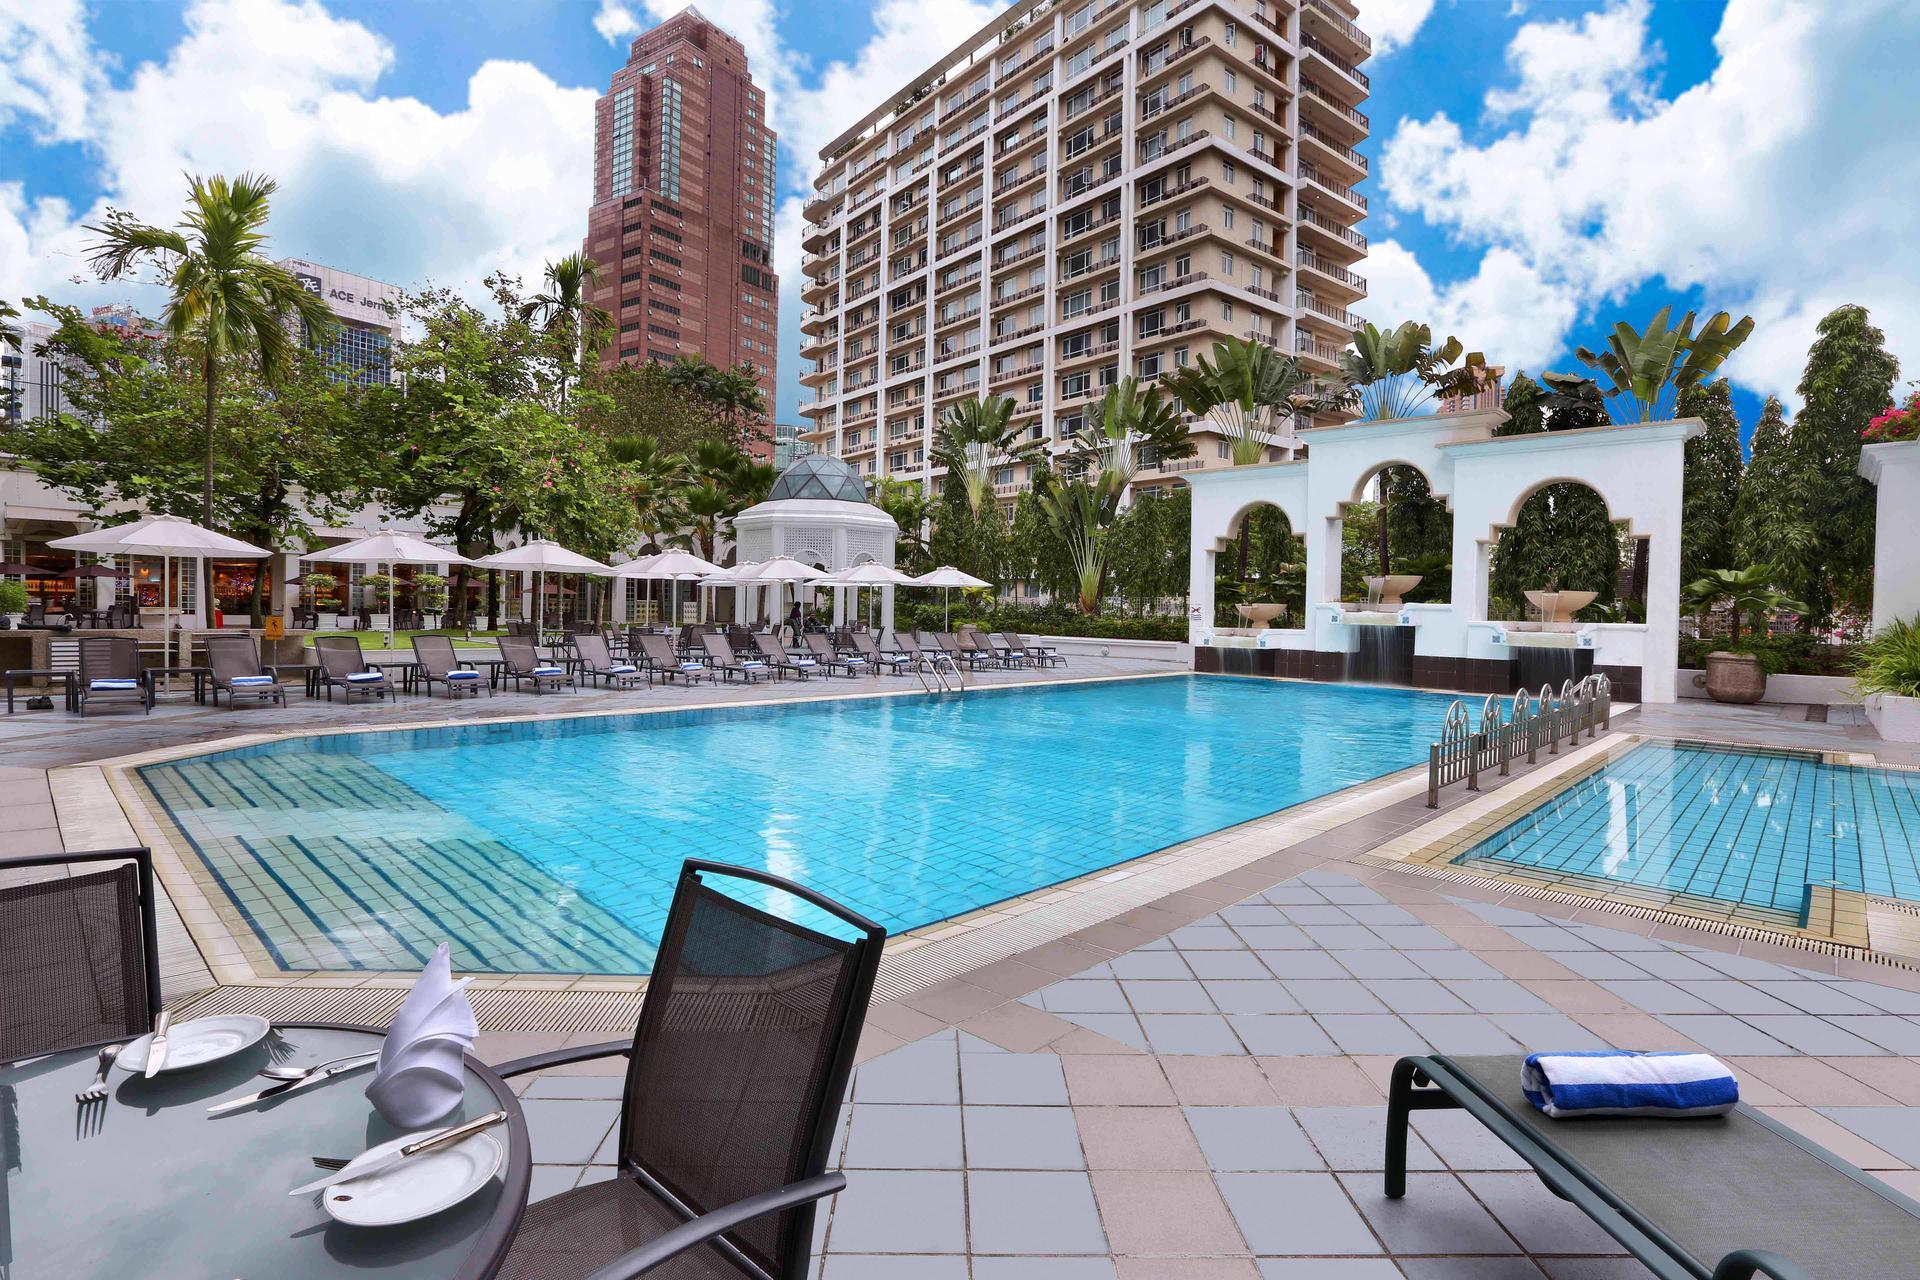 Hotel Istana's outdoor swimming pool